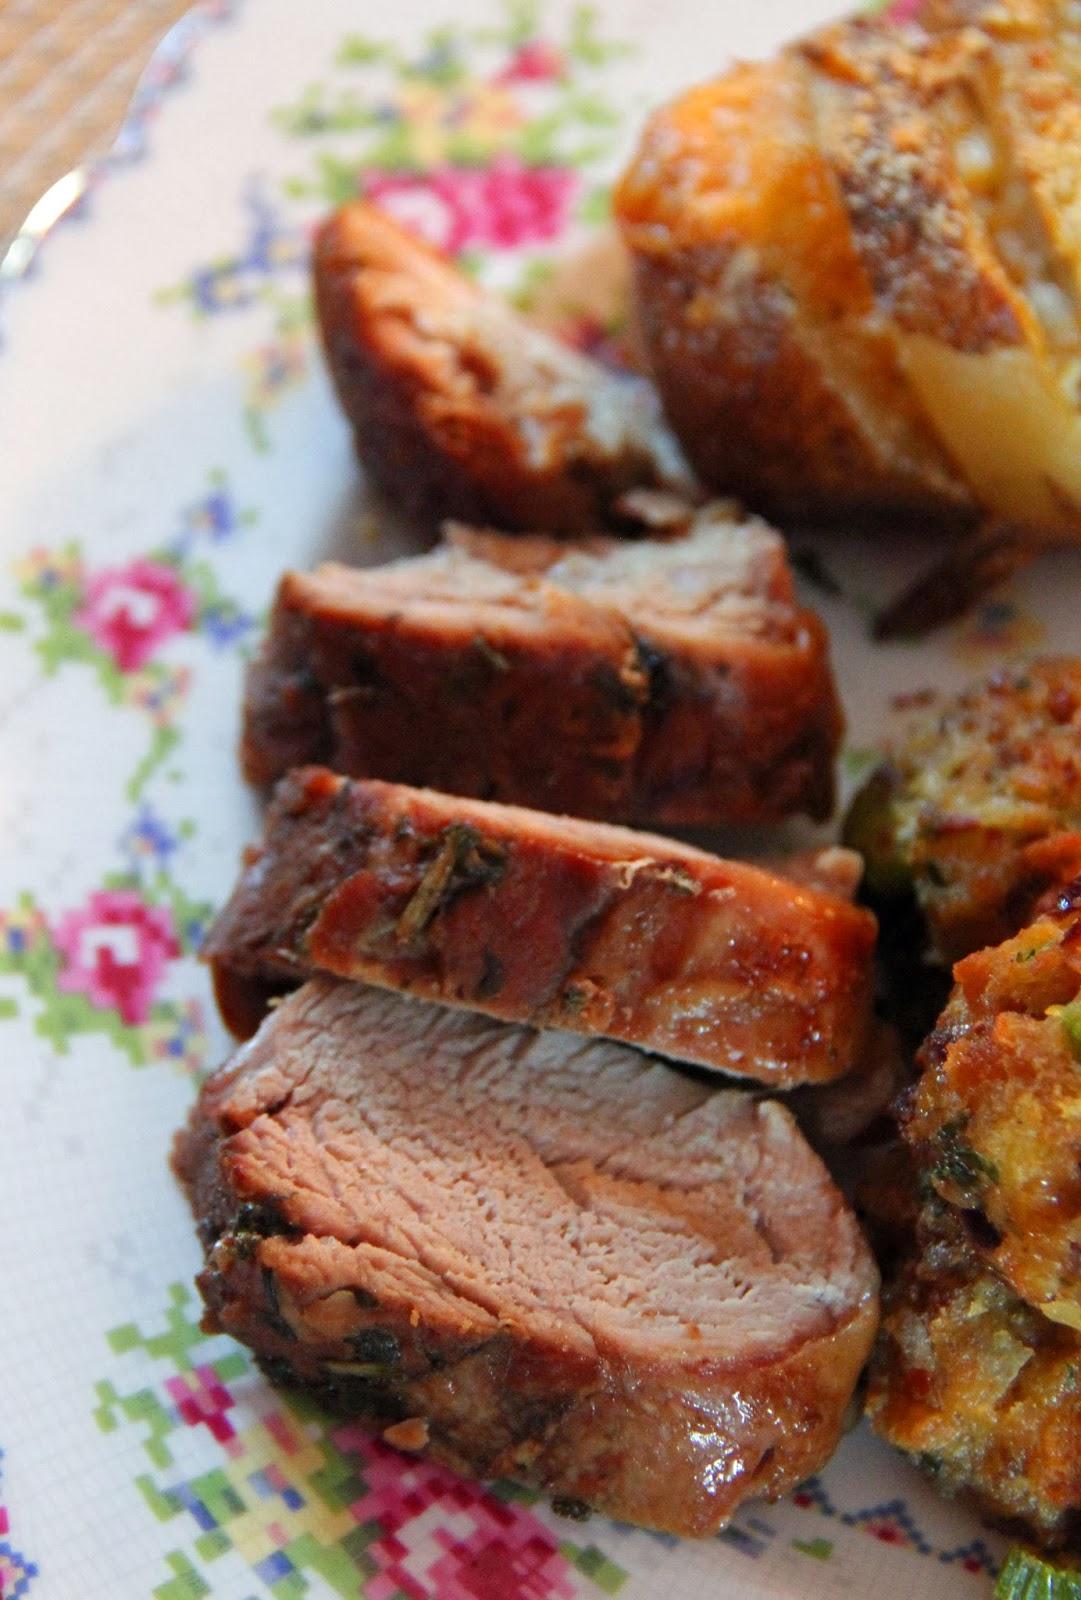 how to cook pork tenderloin in oven with foil uk